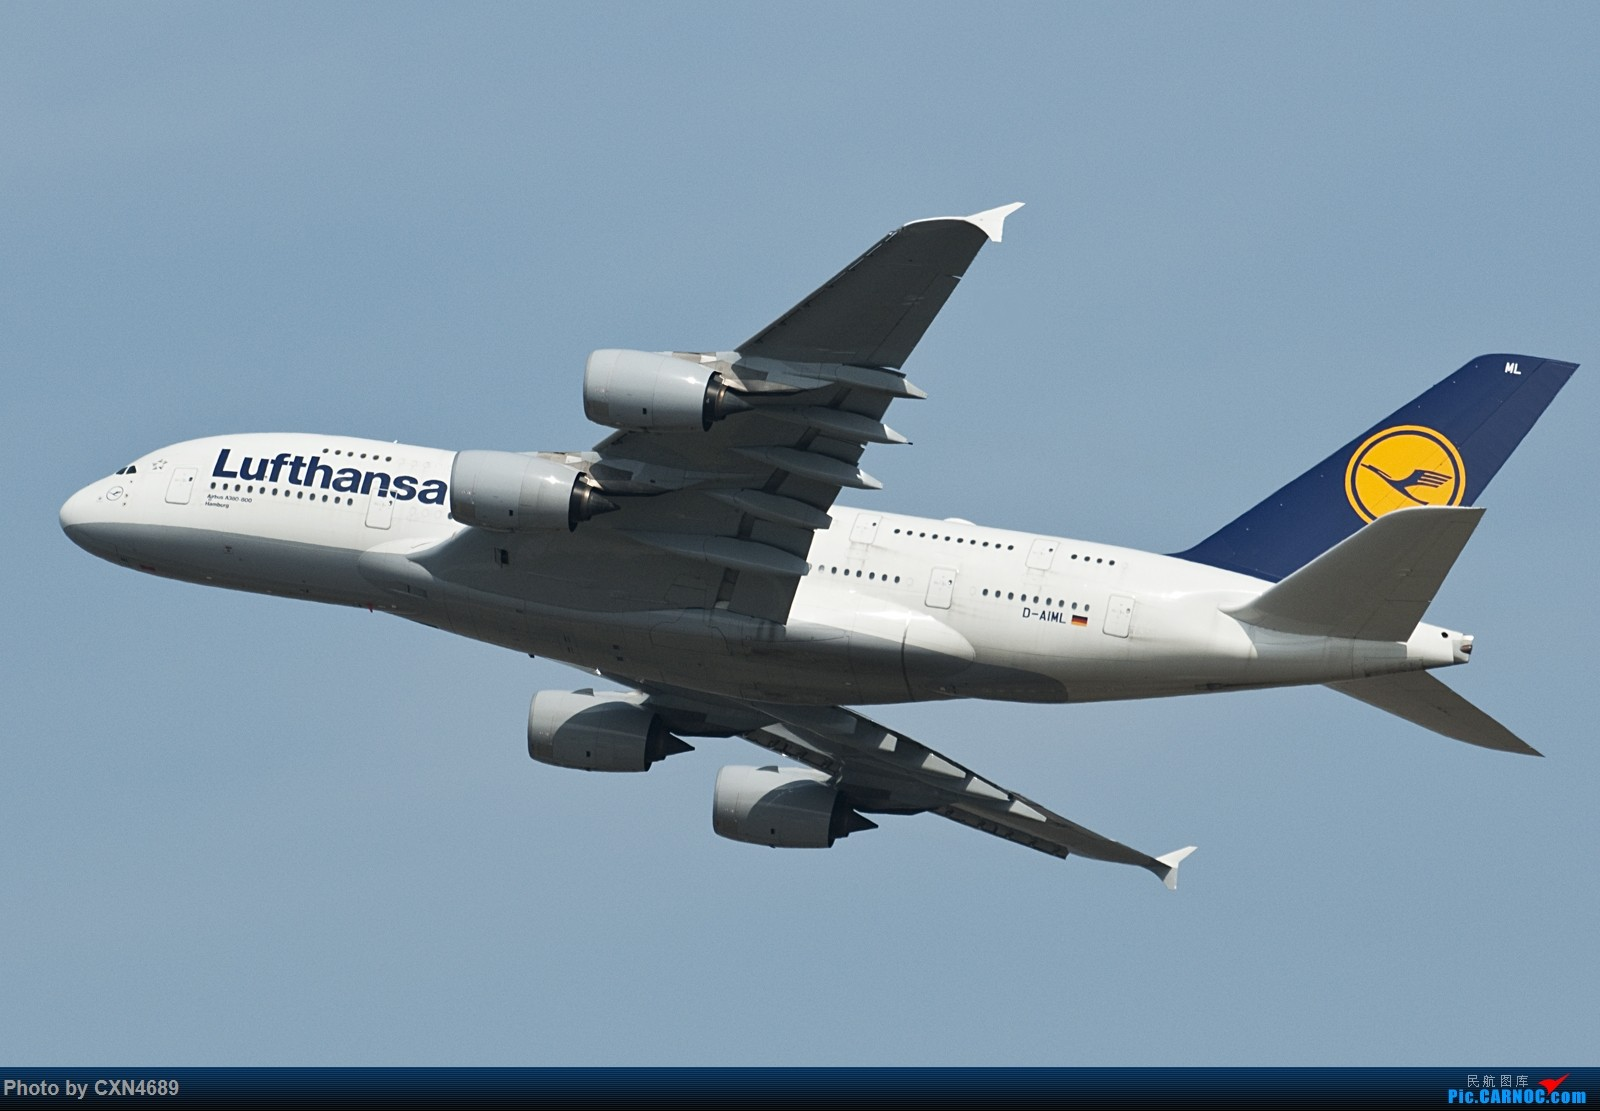 Re:[原创]PVG好天气之N250试镜:A388德胖~(附送几张杂图) AIRBUS A380-800 D-AIML 中国上海浦东国际机场